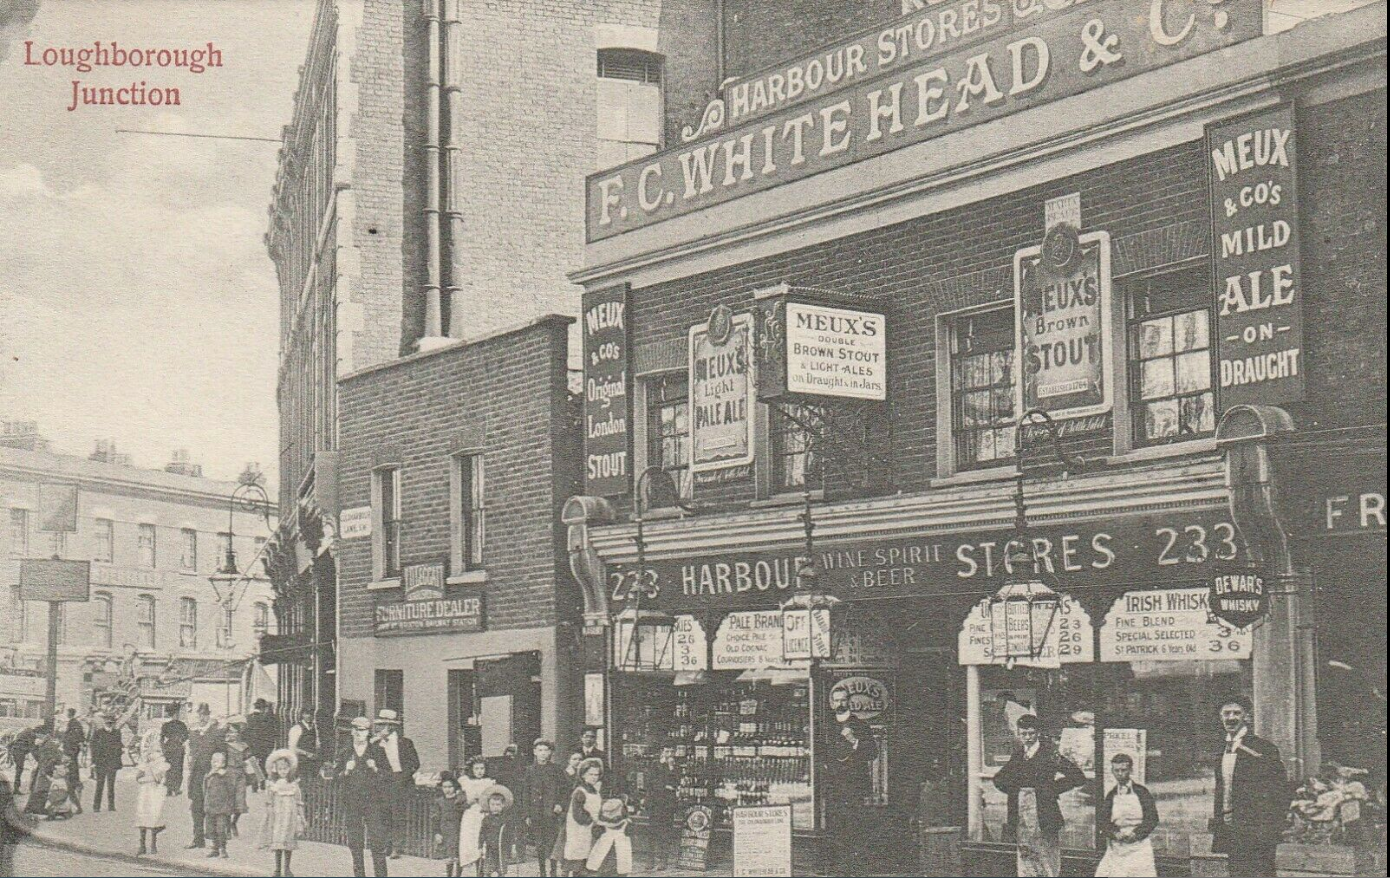 Loughborough Junction Harbour Stores 233 CL